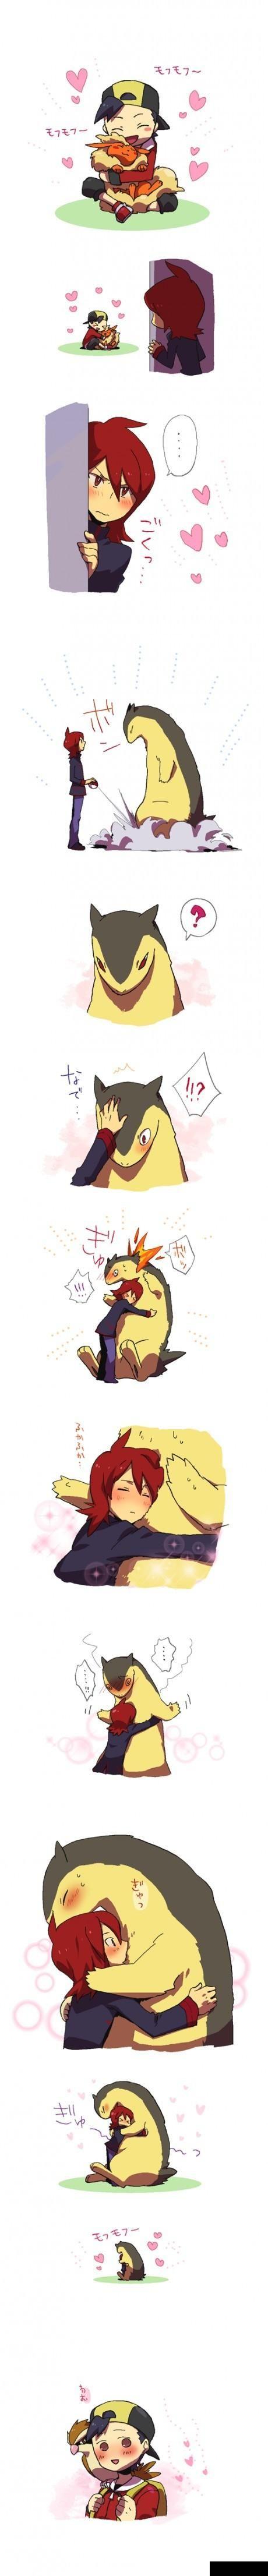 mejores imágenes sobre pokemon en pinterest